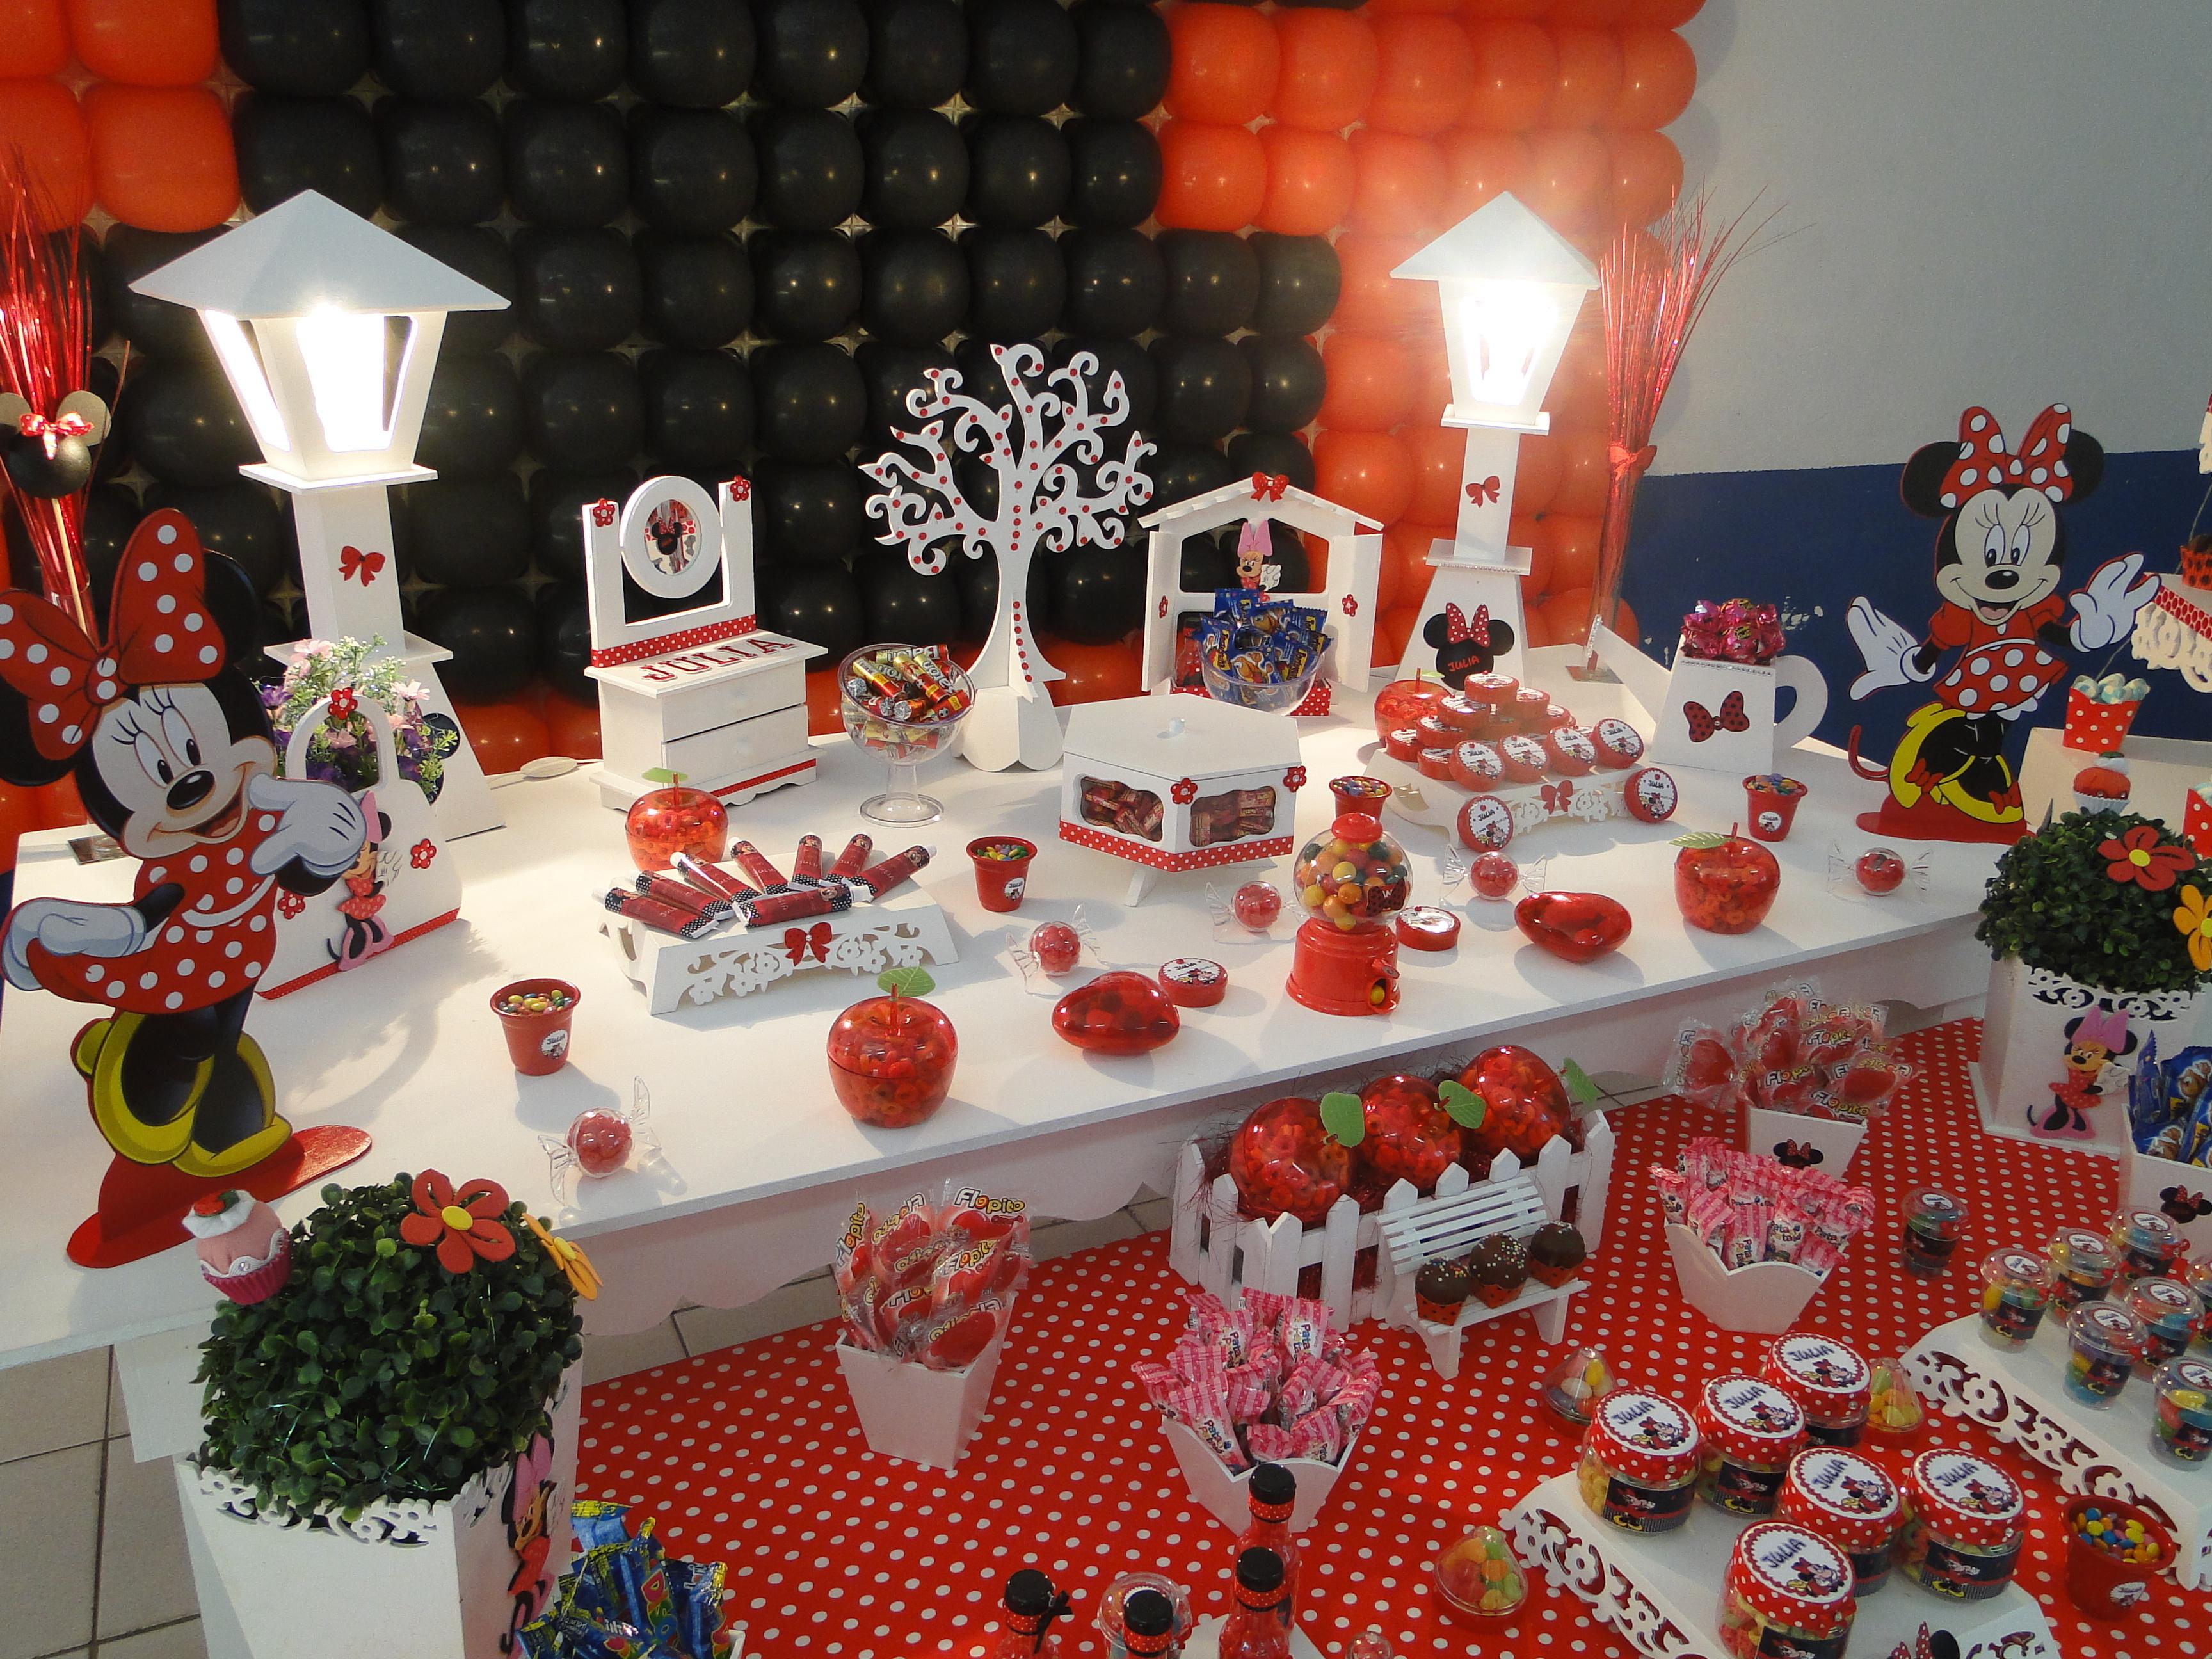 provencal minnie vermelha provencal decoracao provencal minnie